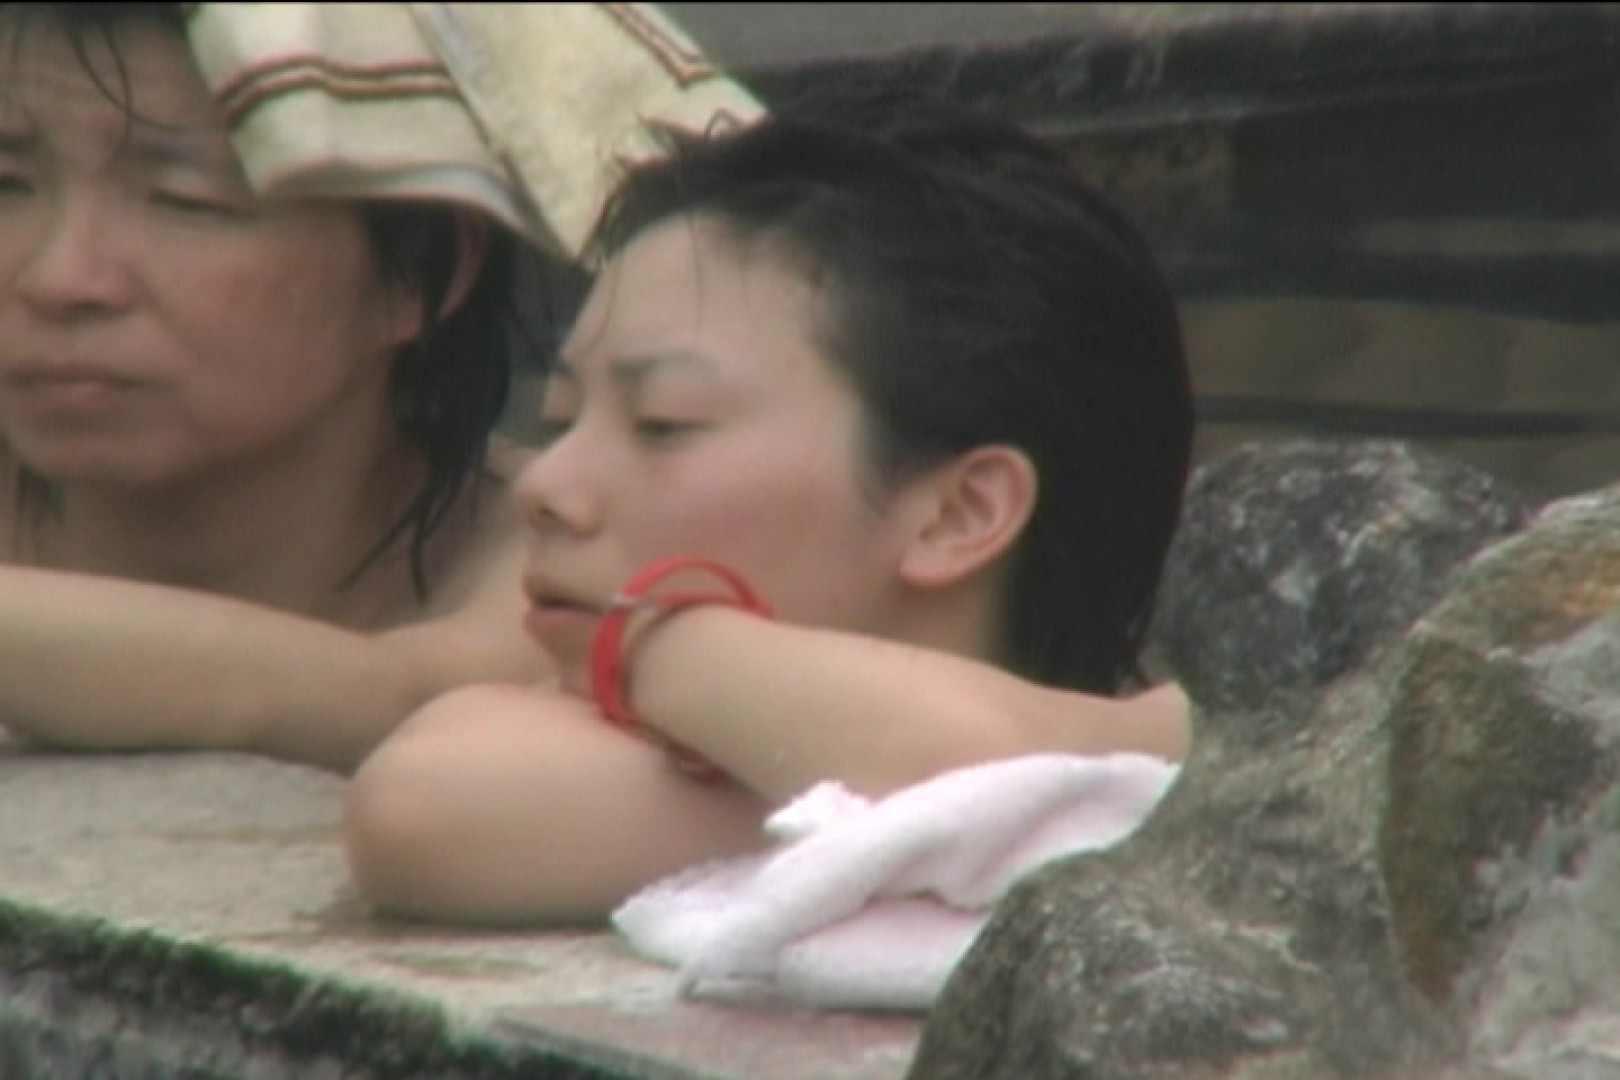 Aquaな露天風呂Vol.122 エッチな盗撮 オメコ無修正動画無料 107pic 30